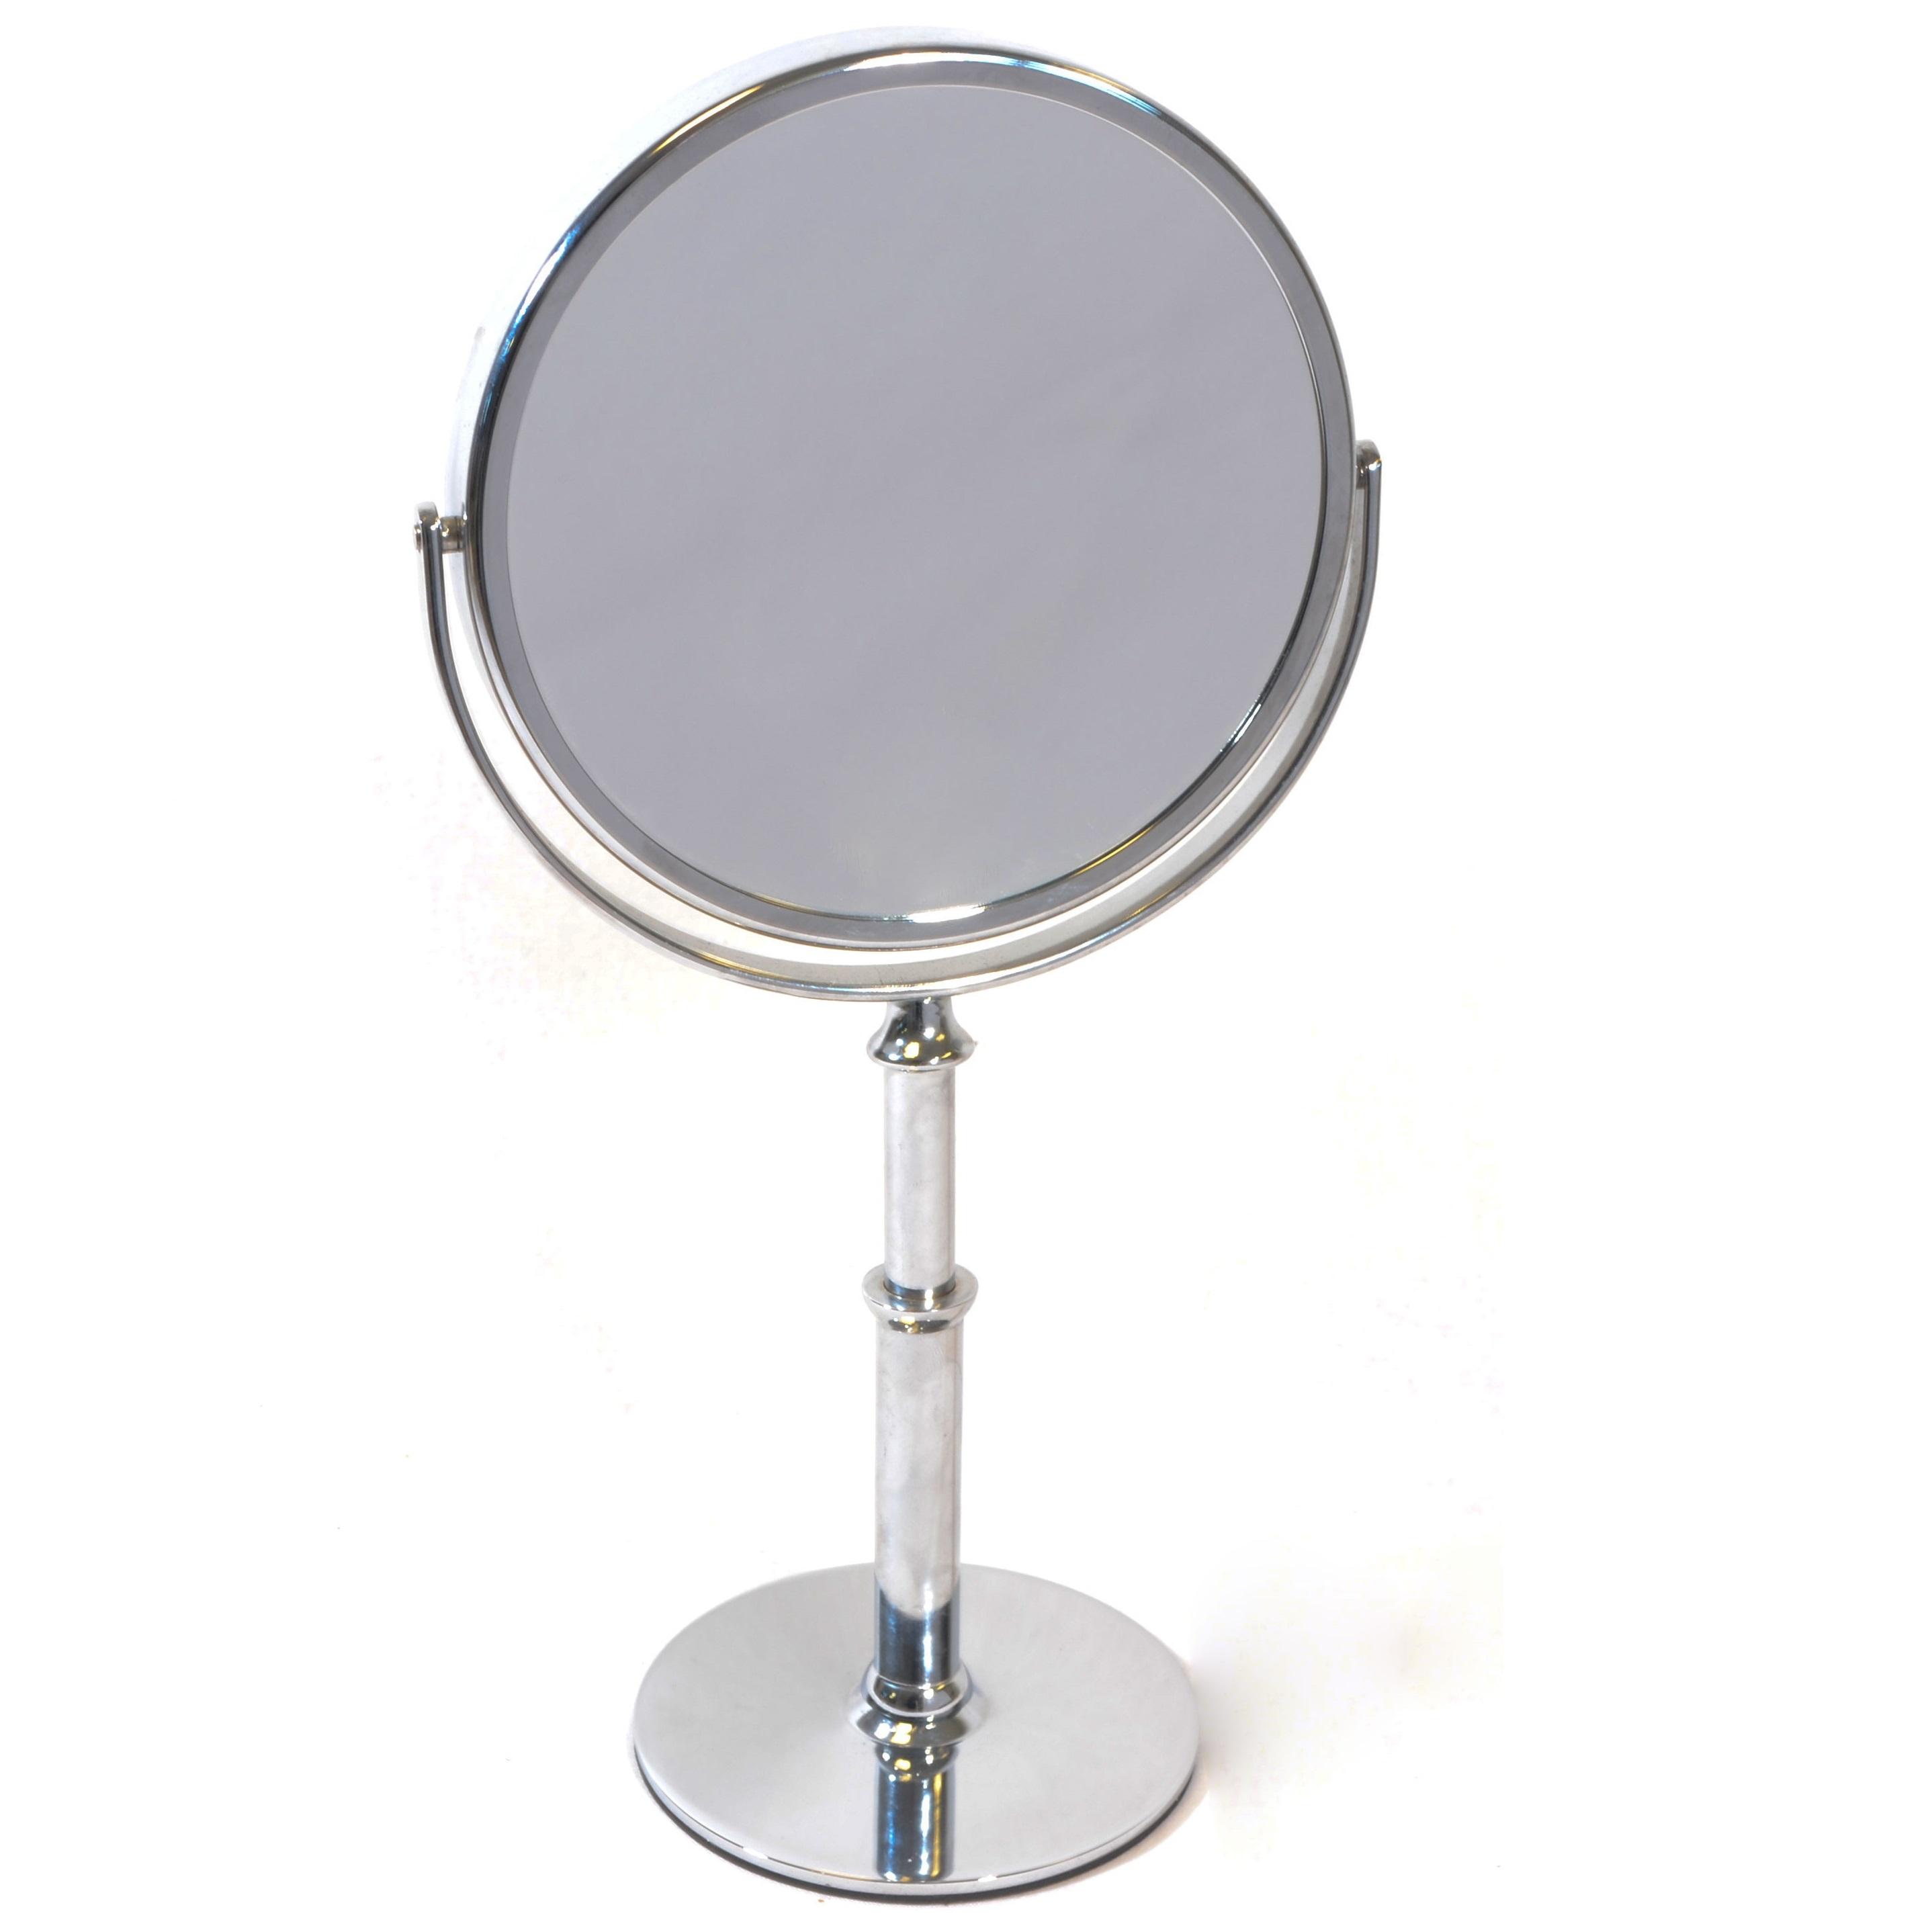 staande hand make up spiegel zilver vergroting 5x 7x of. Black Bedroom Furniture Sets. Home Design Ideas